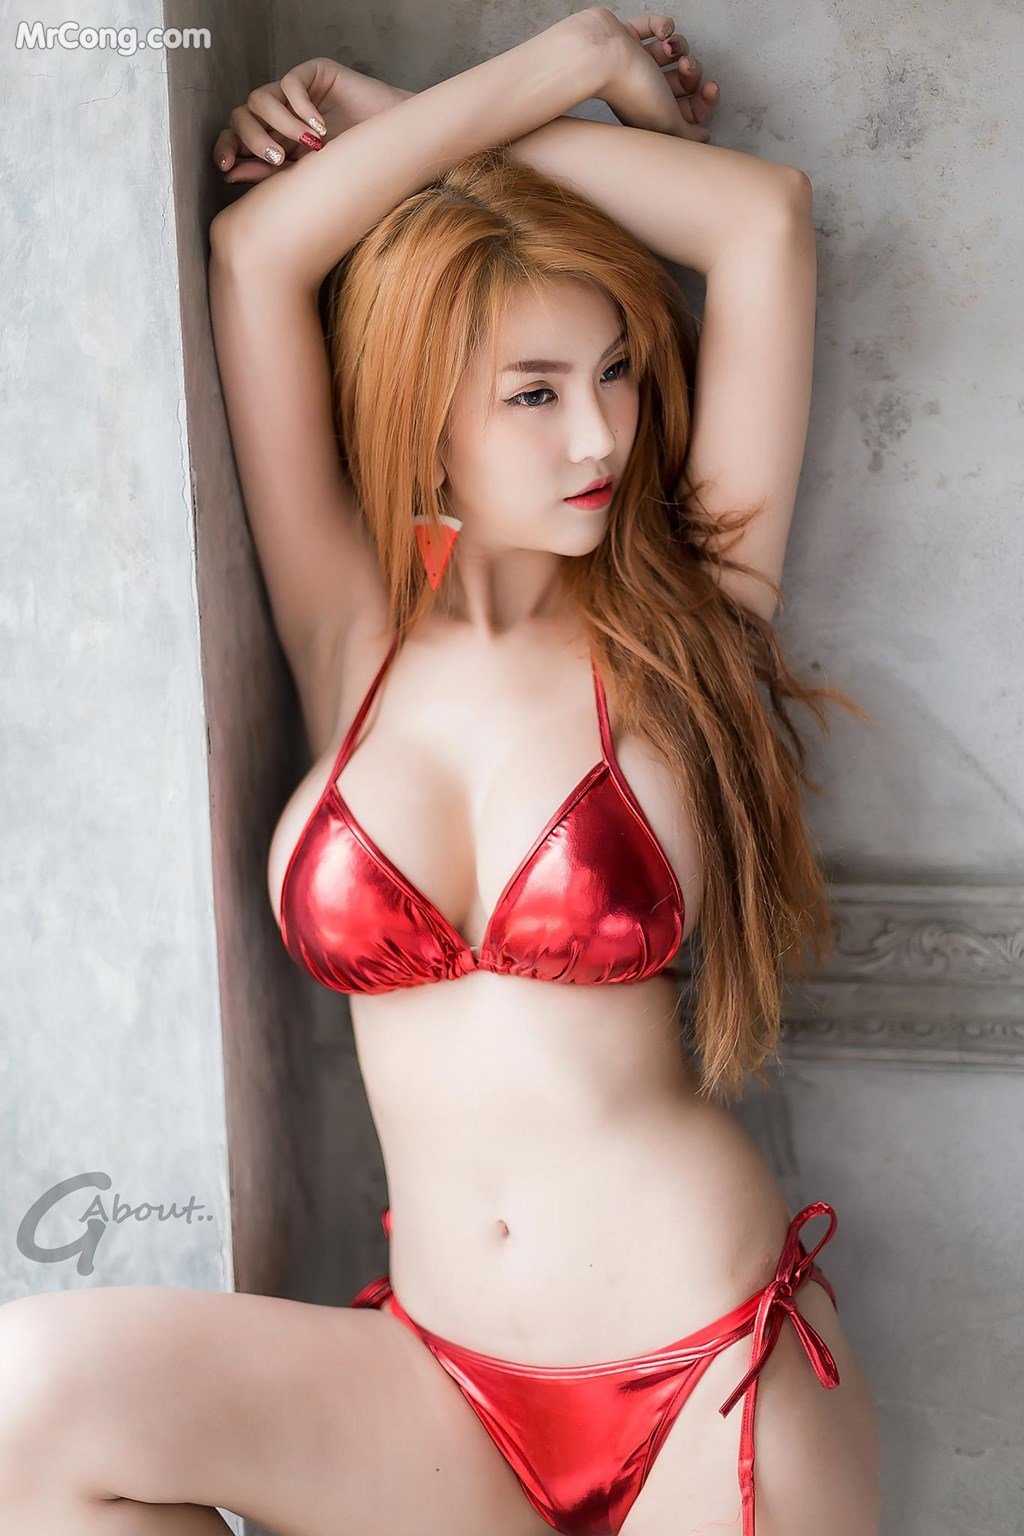 Image Thai-Model-No.482-Alisa-Rattanachawangkul-MrCong.com-004 in post Thai Model No.482: Người mẫu Alisa Rattanachawangkul (9 ảnh)